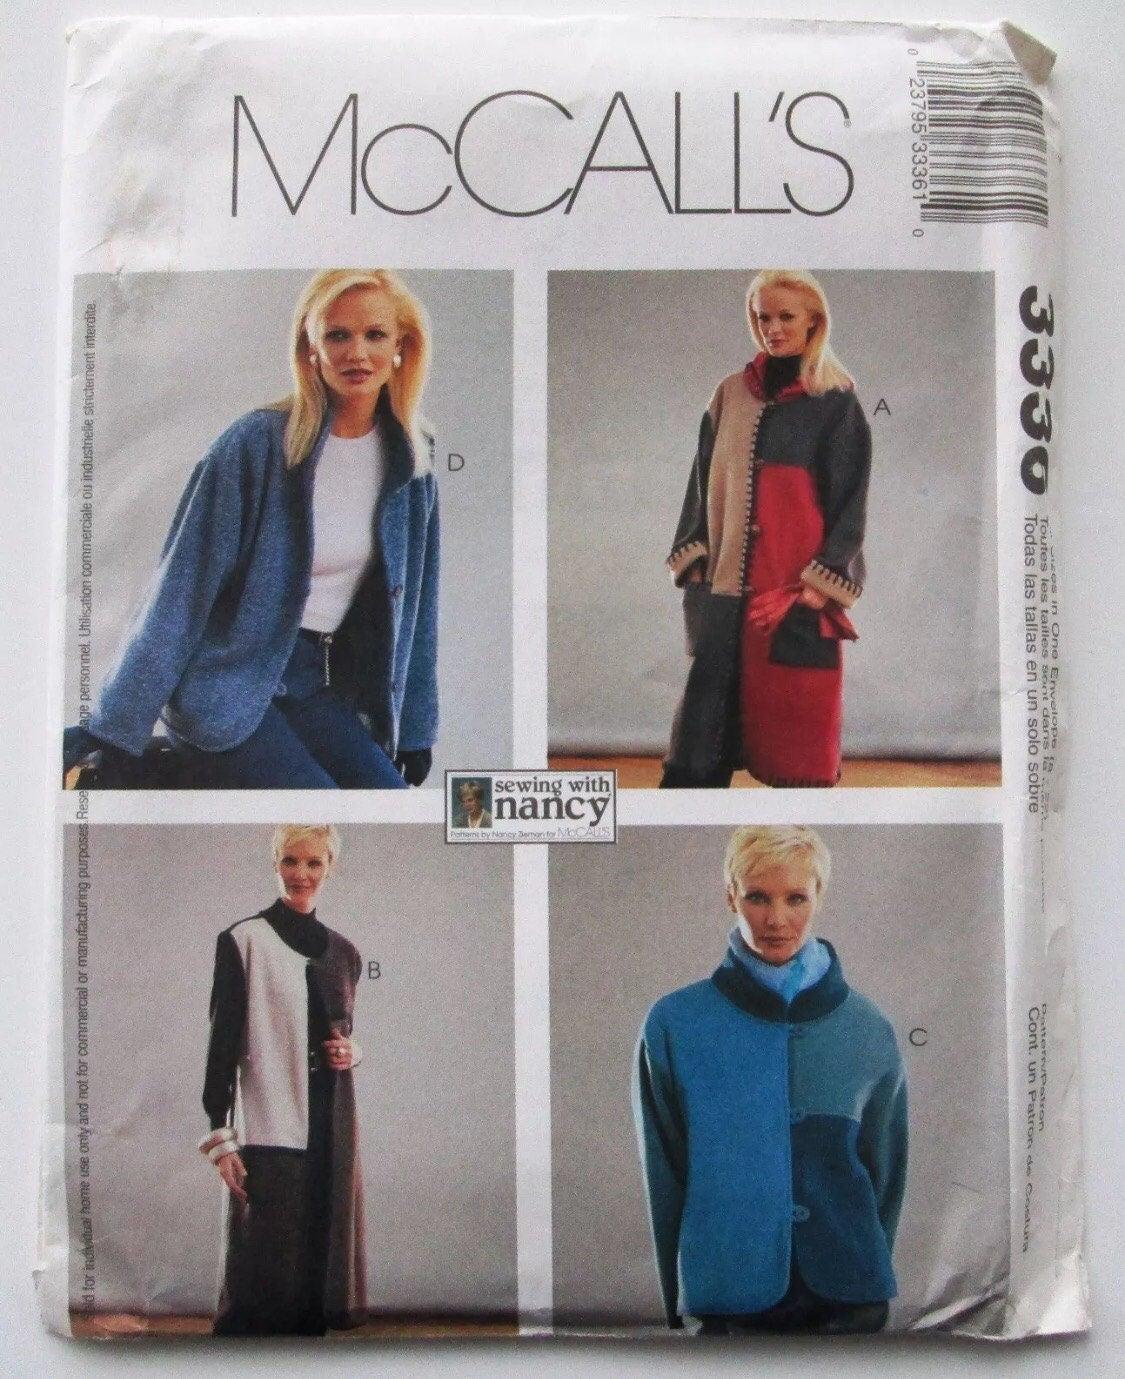 McCalls 3336-Polar-Fleece-Berber-Mantel-Jacke oder Weste